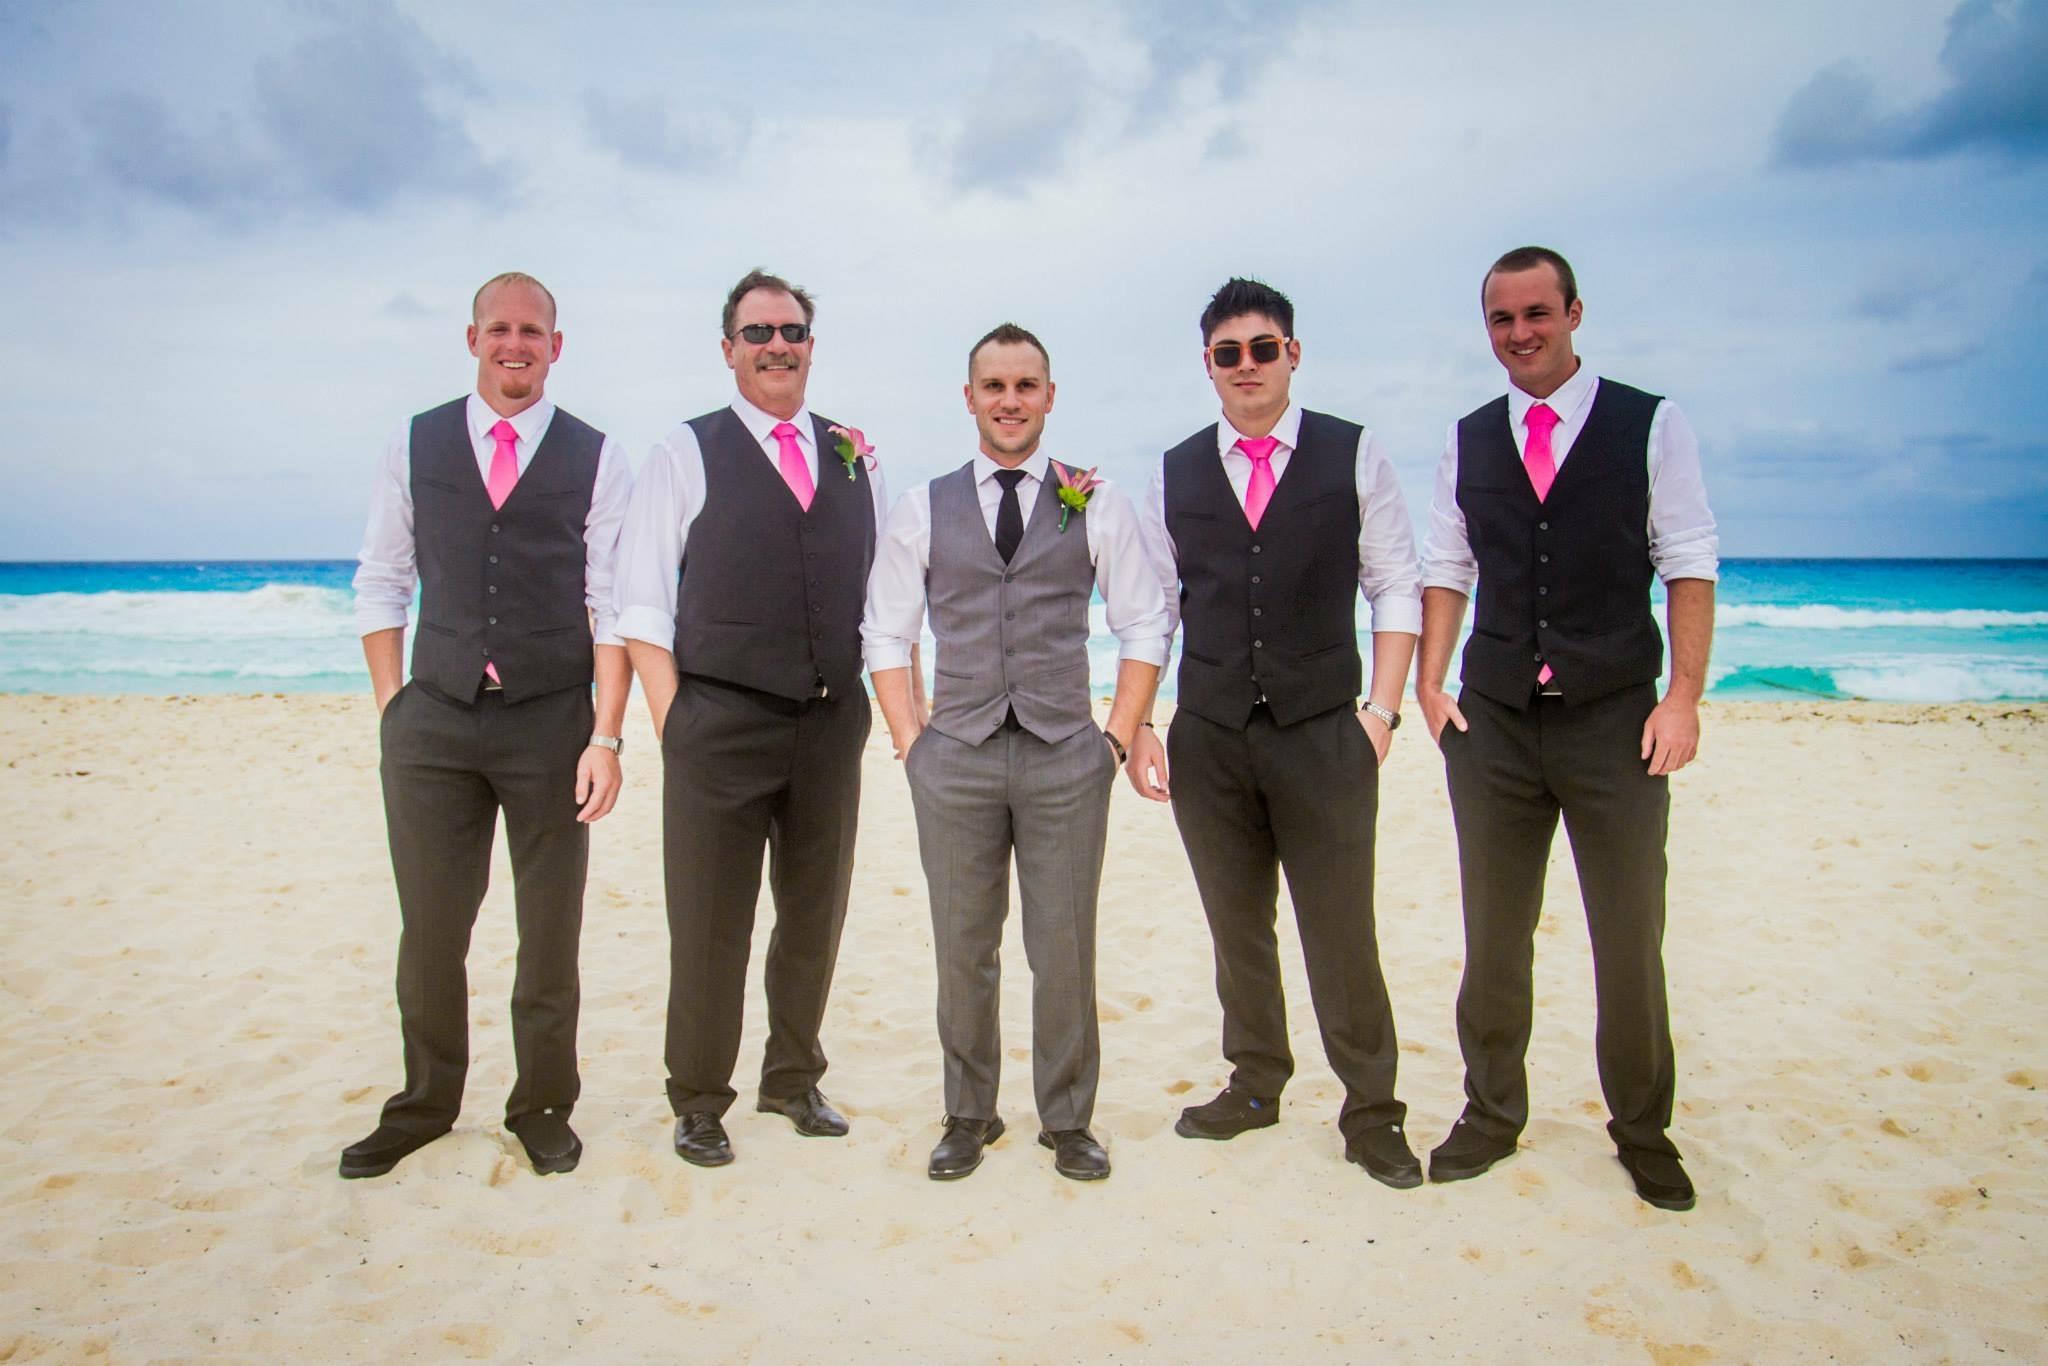 krysten-reed-cancun-beach-wedding-5.JPG